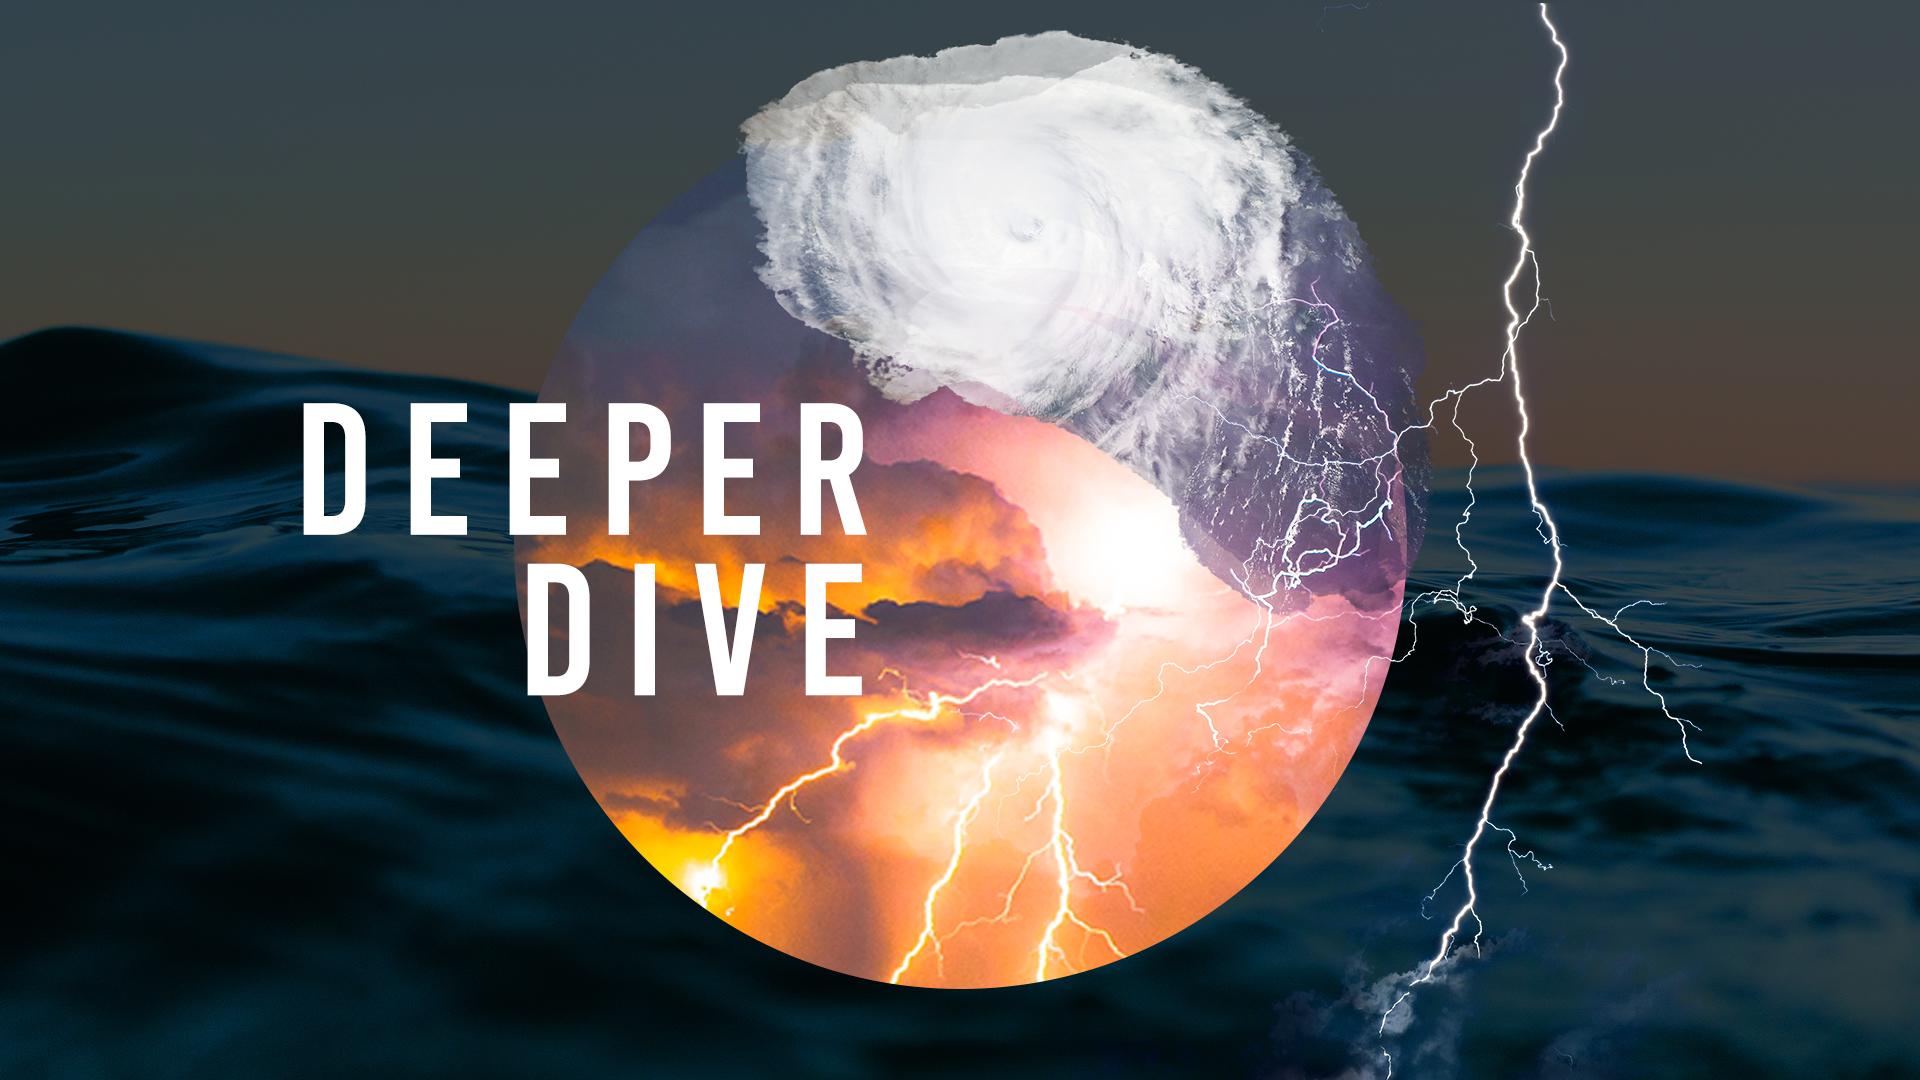 Image: Digital Deeper Dive